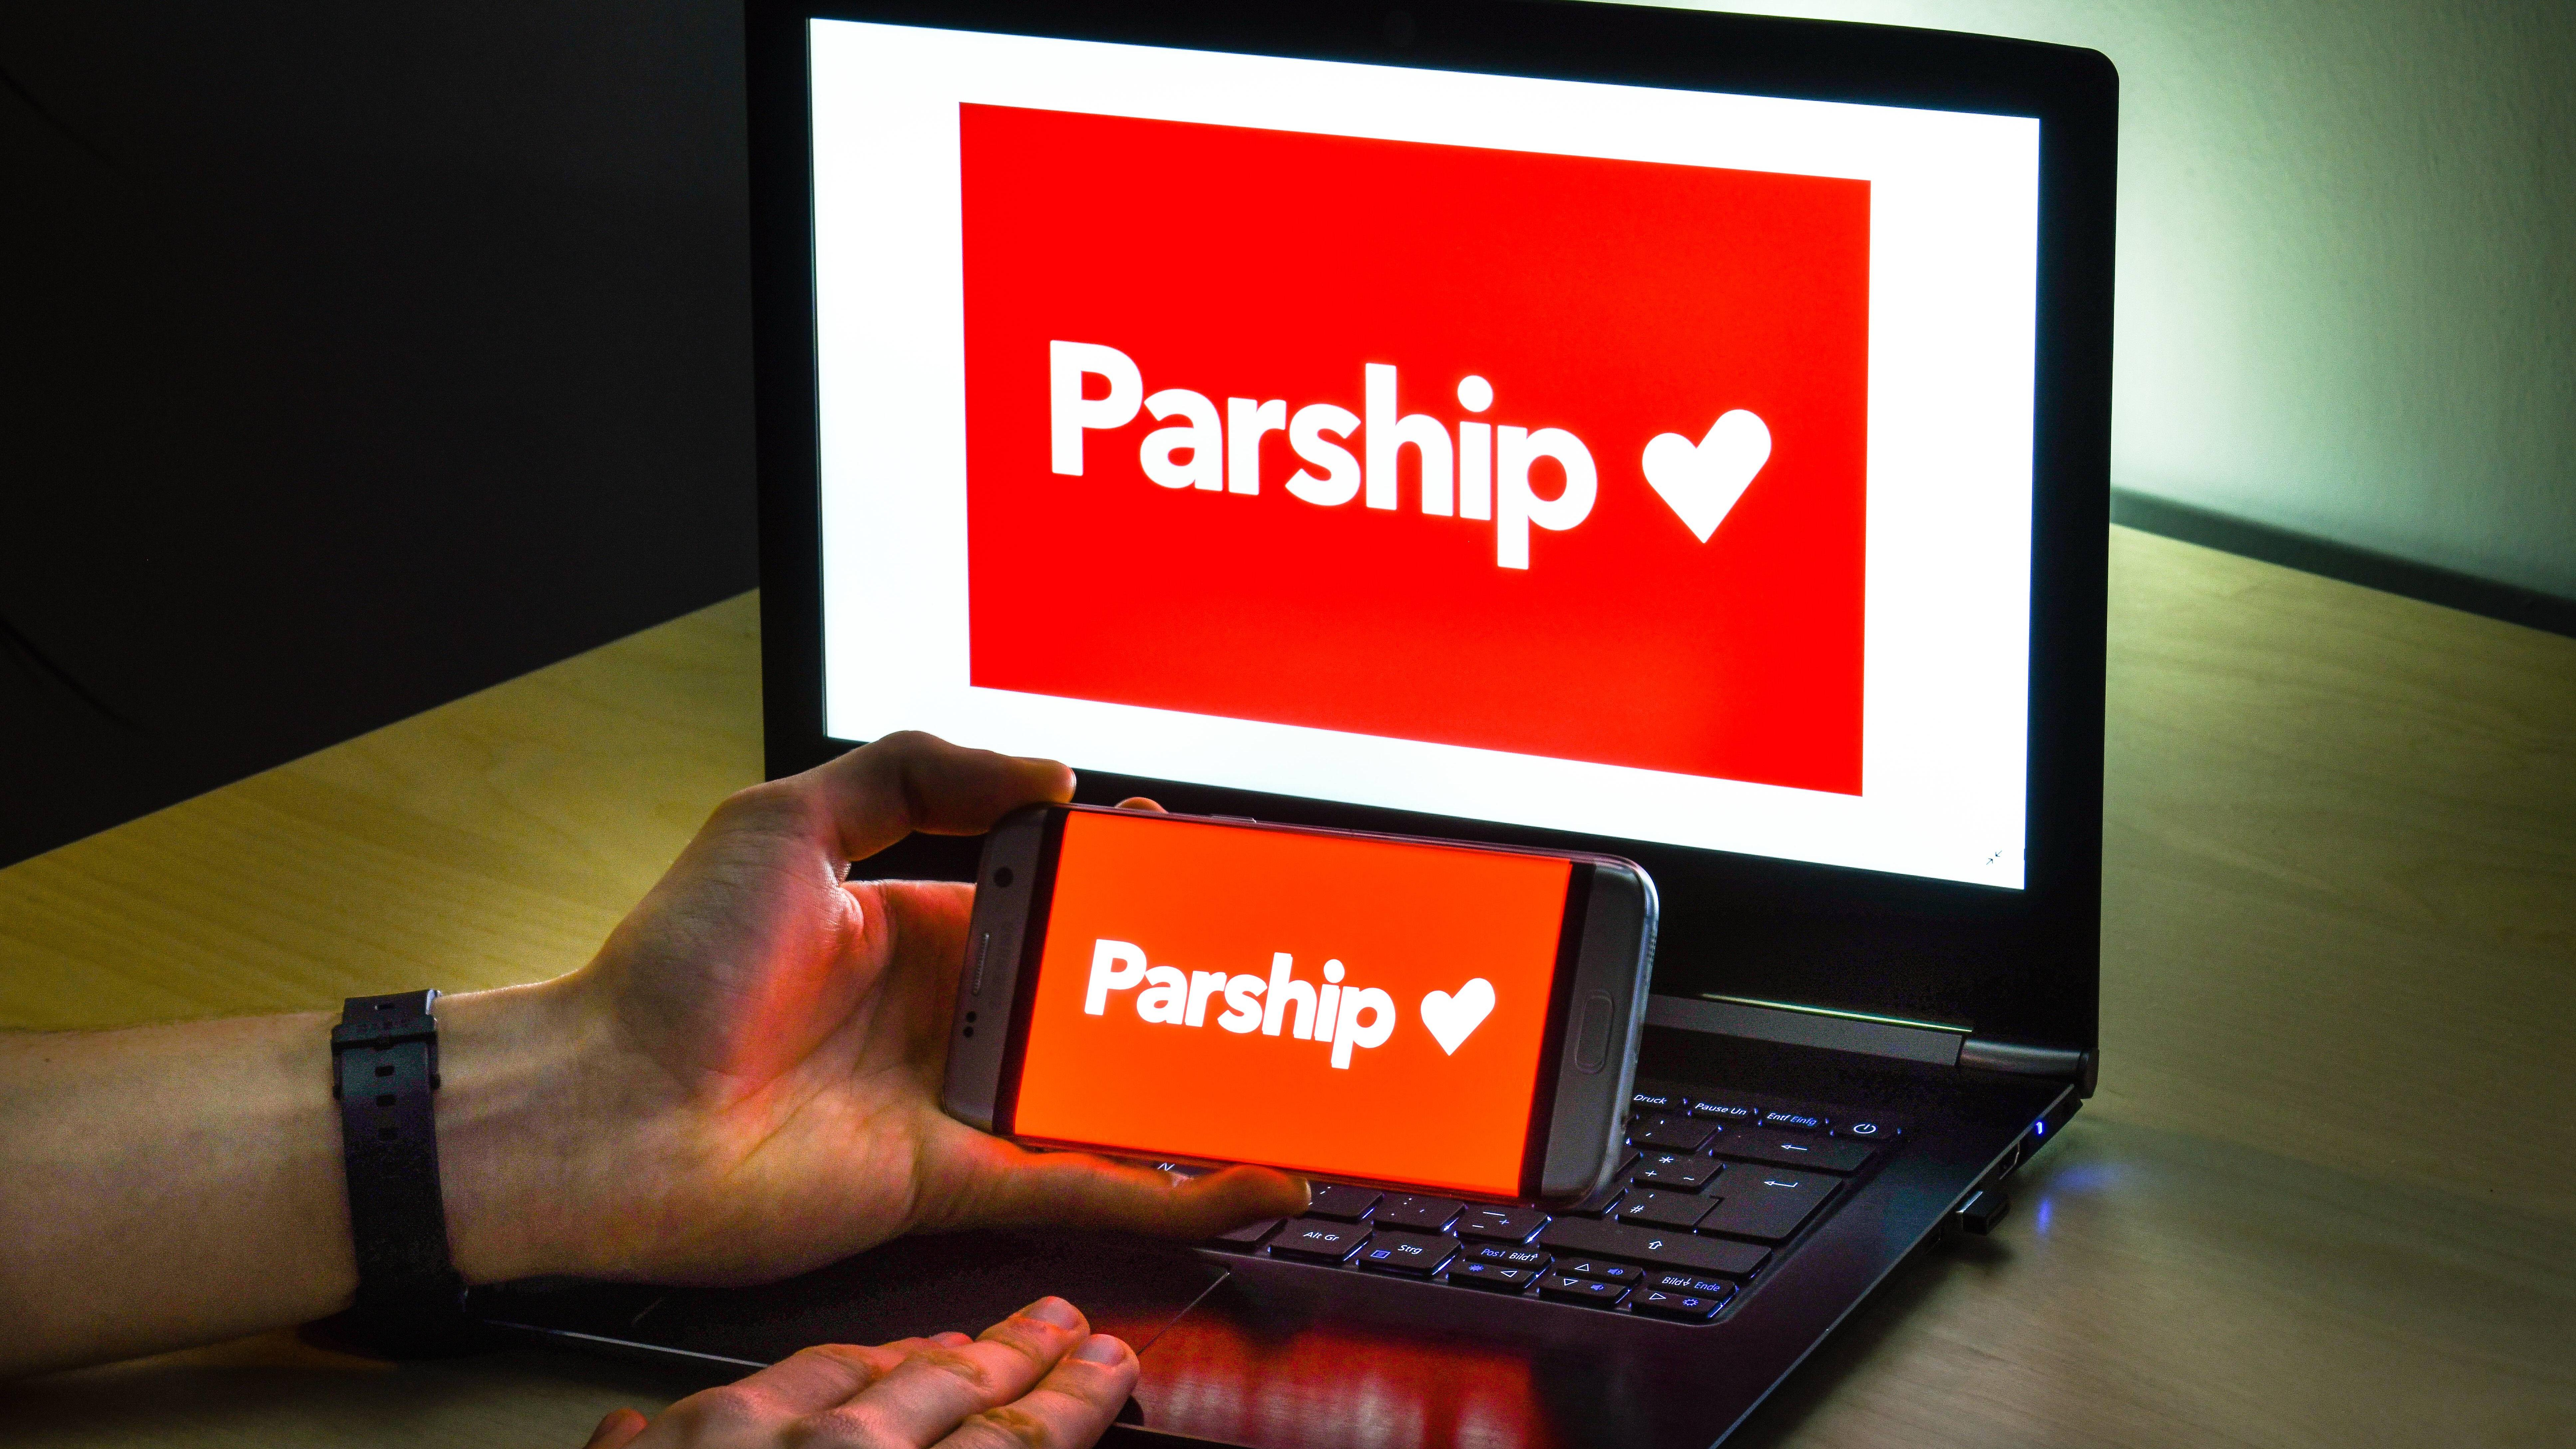 Parship pausieren - so klappt's